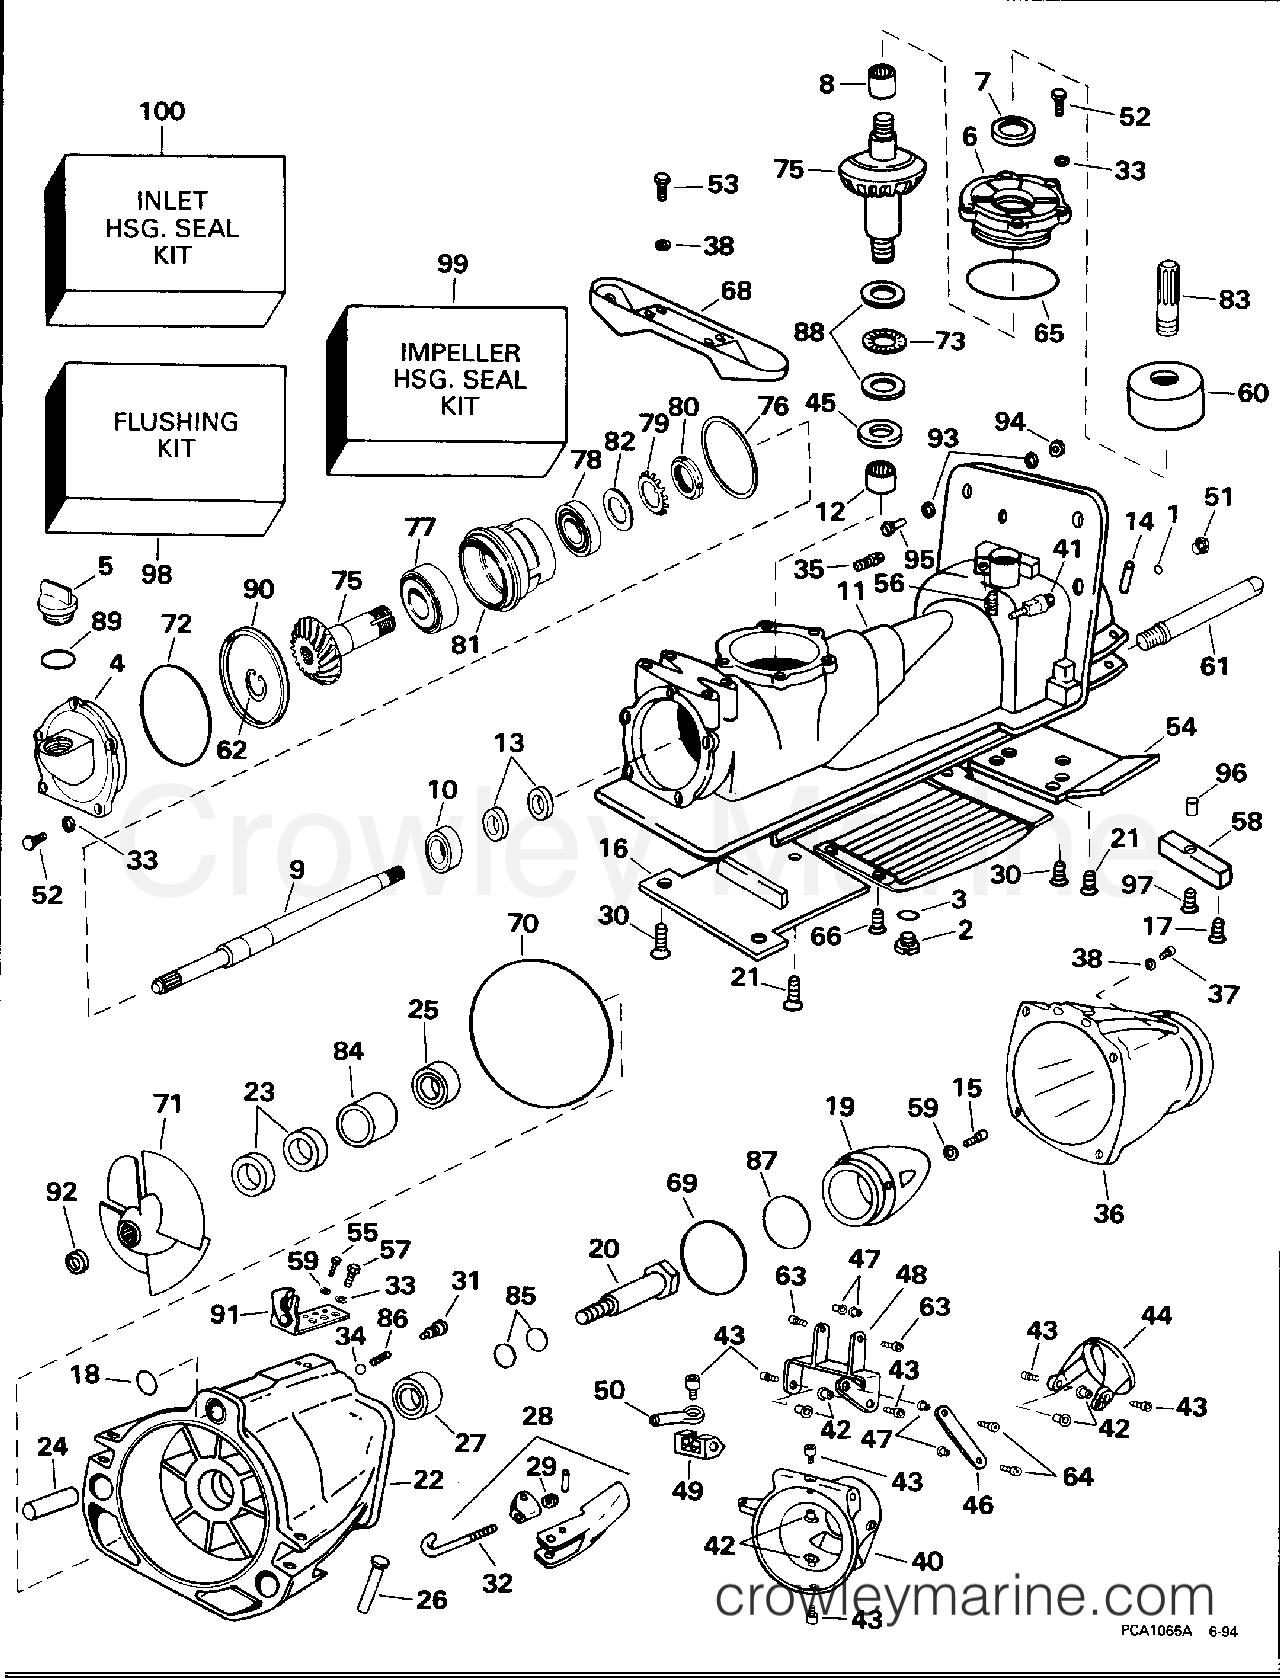 DIAGRAM] Wiring Diagram Omc 115 Turbojet FULL Version HD Quality 115  Turbojet - WAREHOUSEDESIGN.JTNETTOYAGE.FRwarehousedesign.jtnettoyage.fr